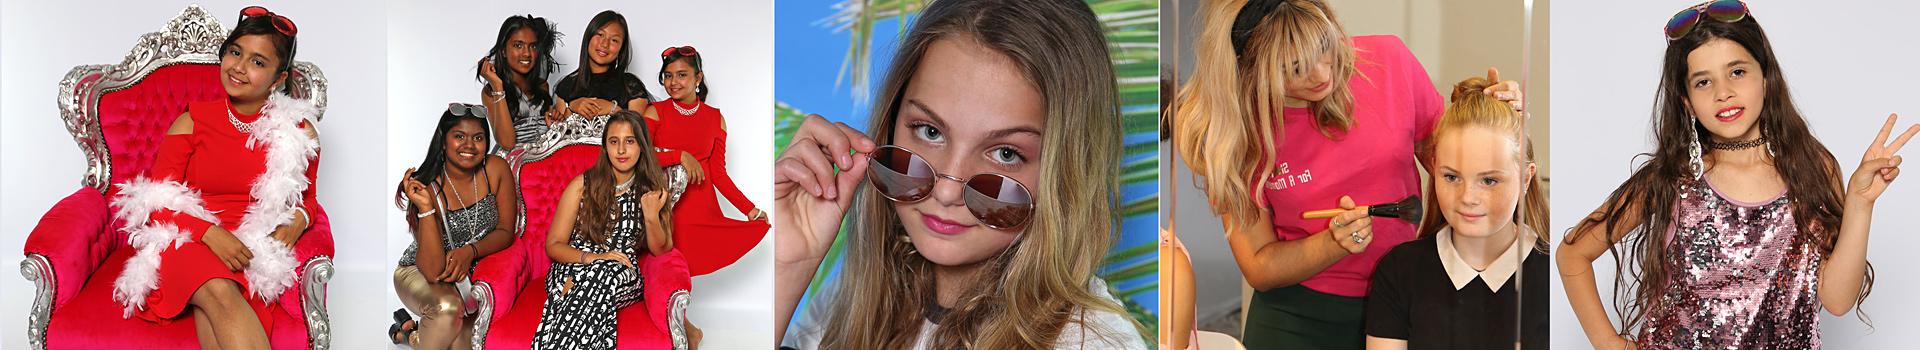 Beauty en Glamour party betaalbaar kinderfeestje met professionele foto's